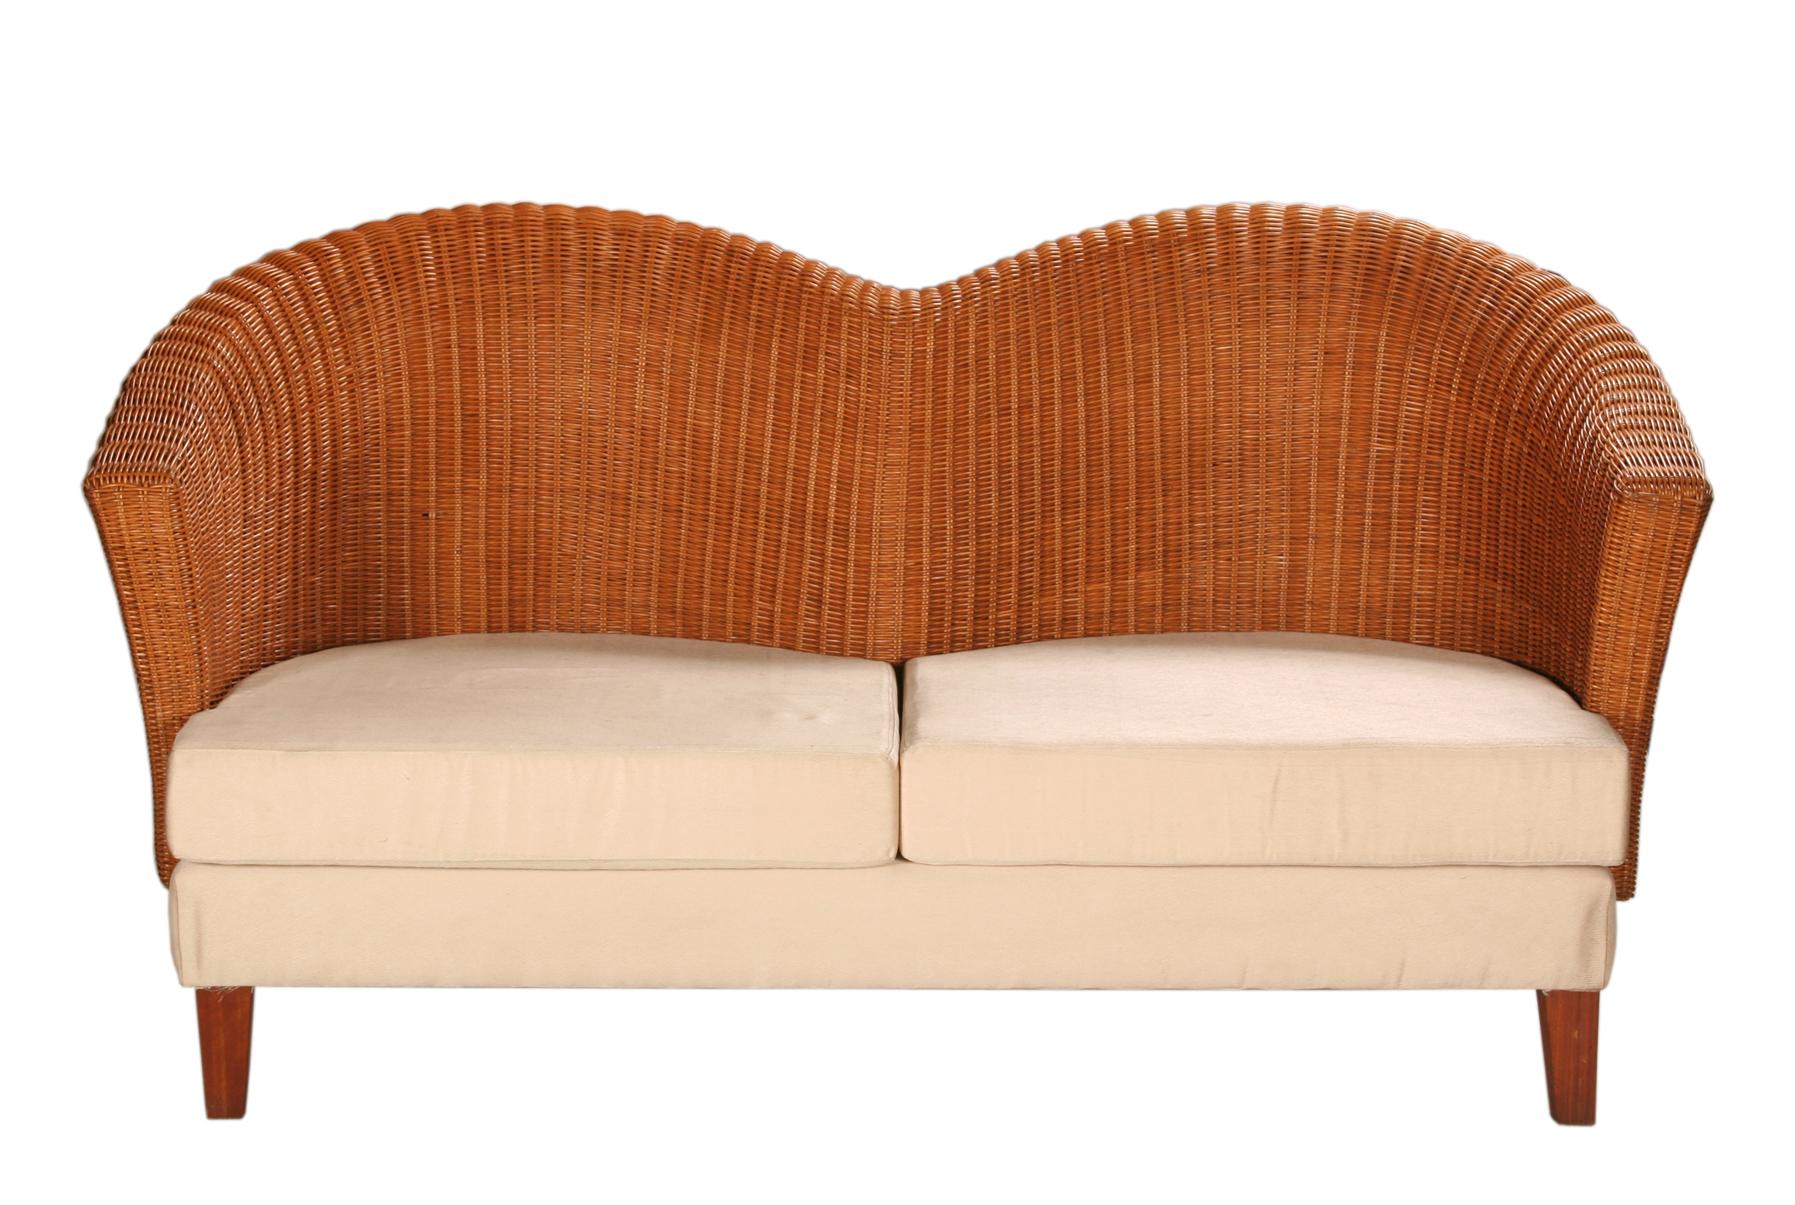 Full Size of Chippendale Sofa Table Furniture For Sale Sofas Ethan Allen Uk Cover Rattan Bali Billig Big Leder Halbrund Kleines Wohnzimmer Husse Online Kaufen Canape Sofa Chippendale Sofa